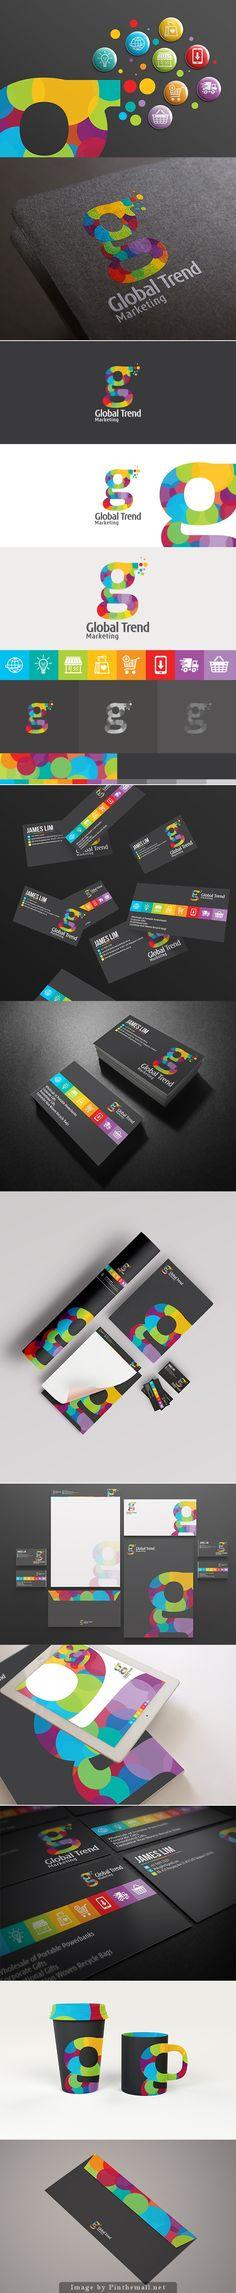 https://social-media-strategy-template.blogspot.com/ #SocialMedia Brand Identity, Logo Design, Global Trend Branding